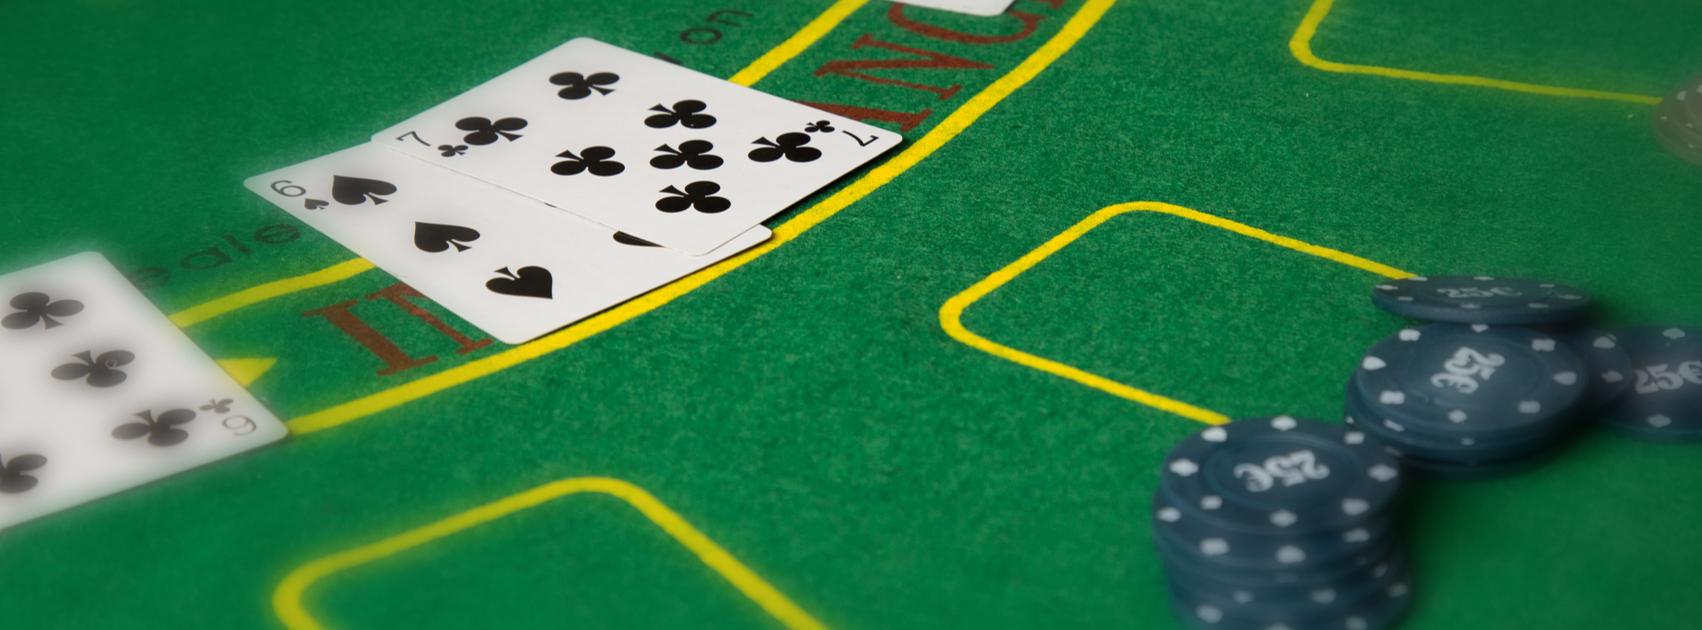 Blackjack Online Ireland